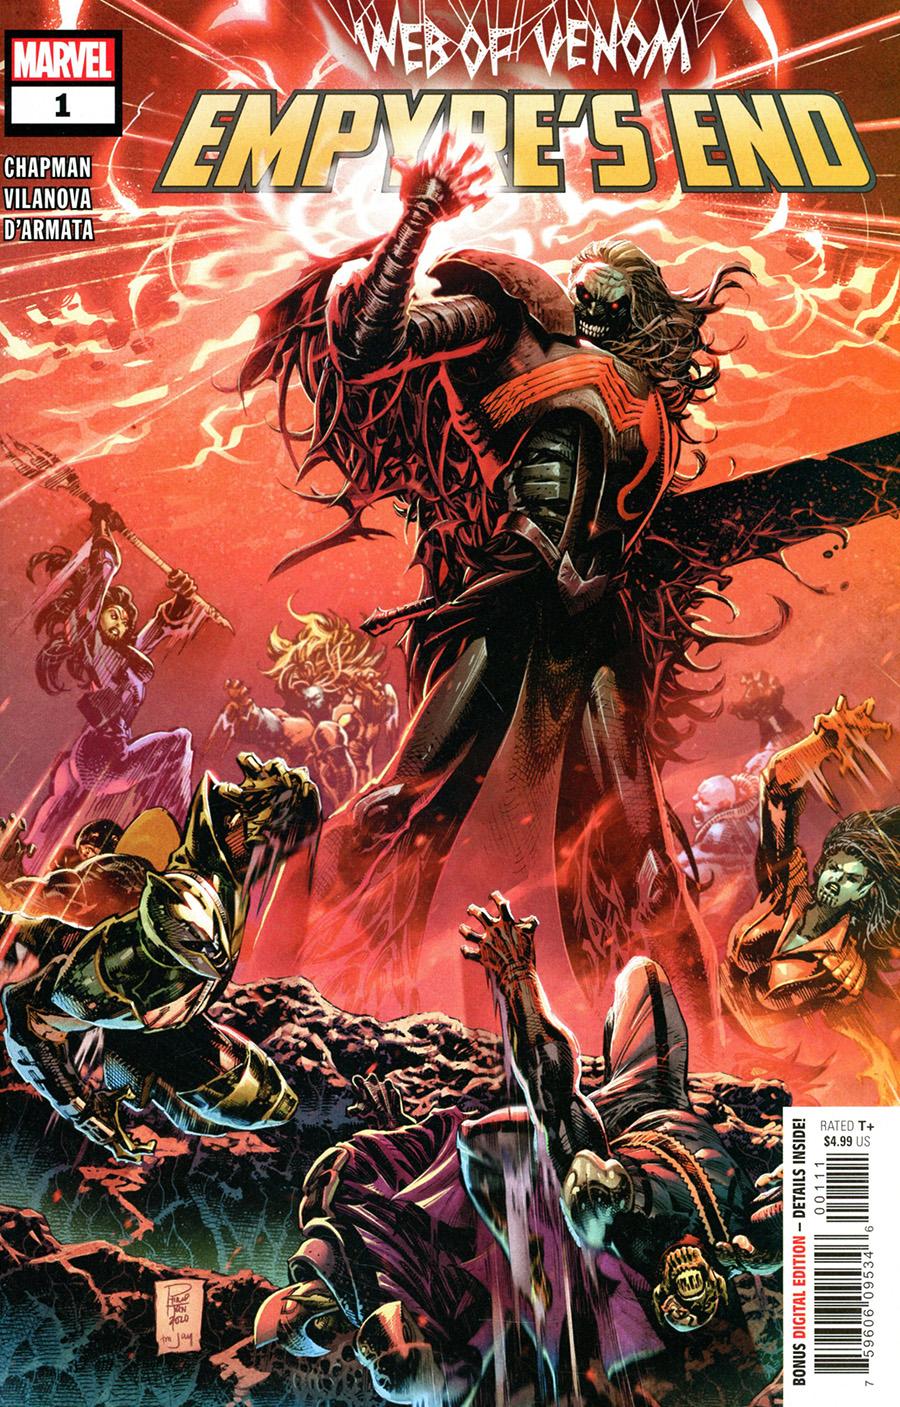 Web Of Venom Empyres End #1 Cover A Regular Philip Tan Cover